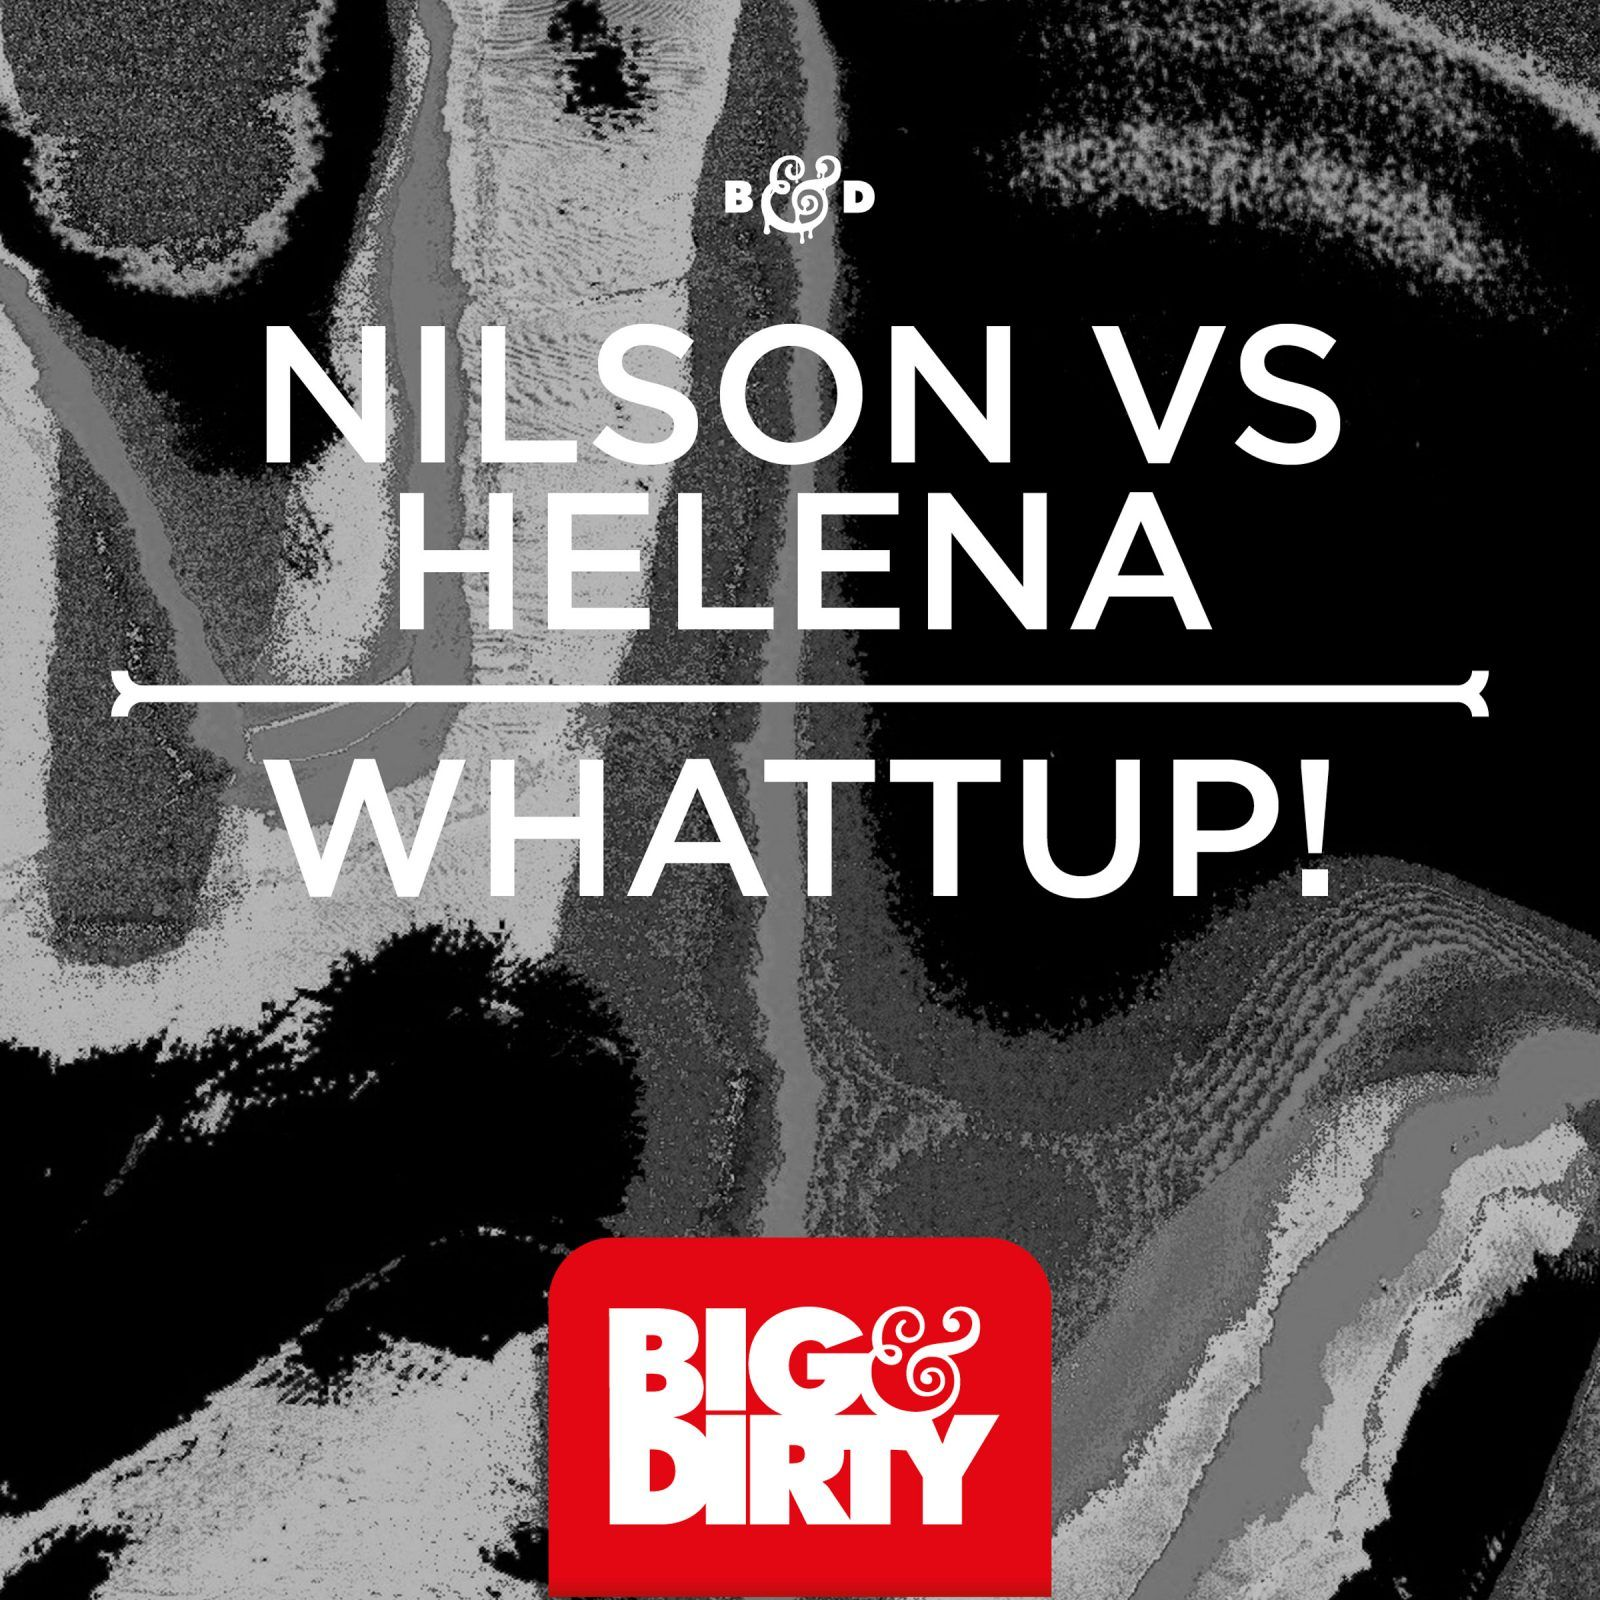 badr244nilson-vs-helena-whattup-2400x2400.jpg